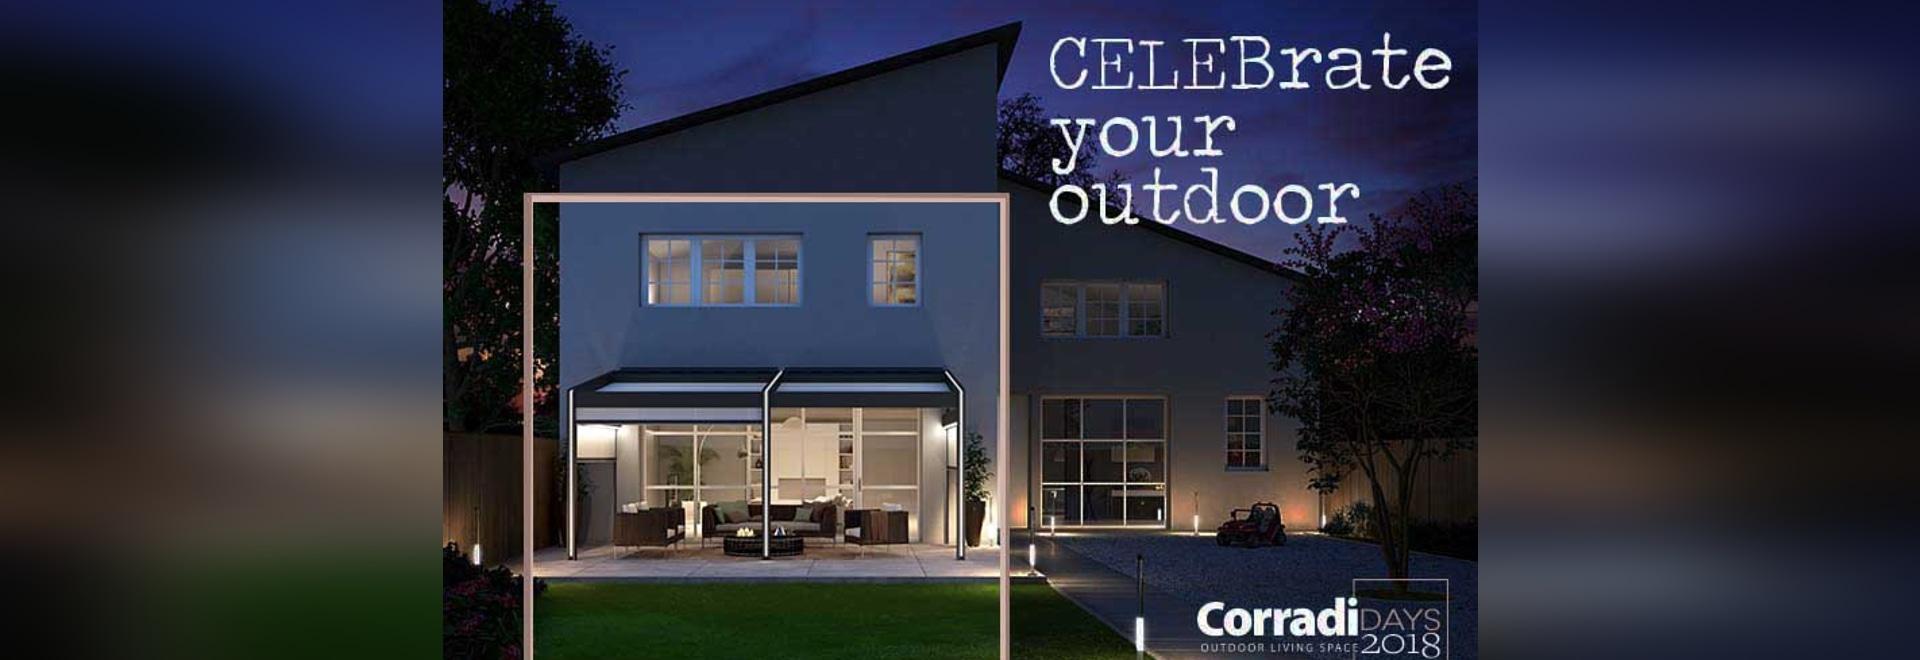 Corradi Days to celebrate Corradi's 40th birthday, starting May 26th